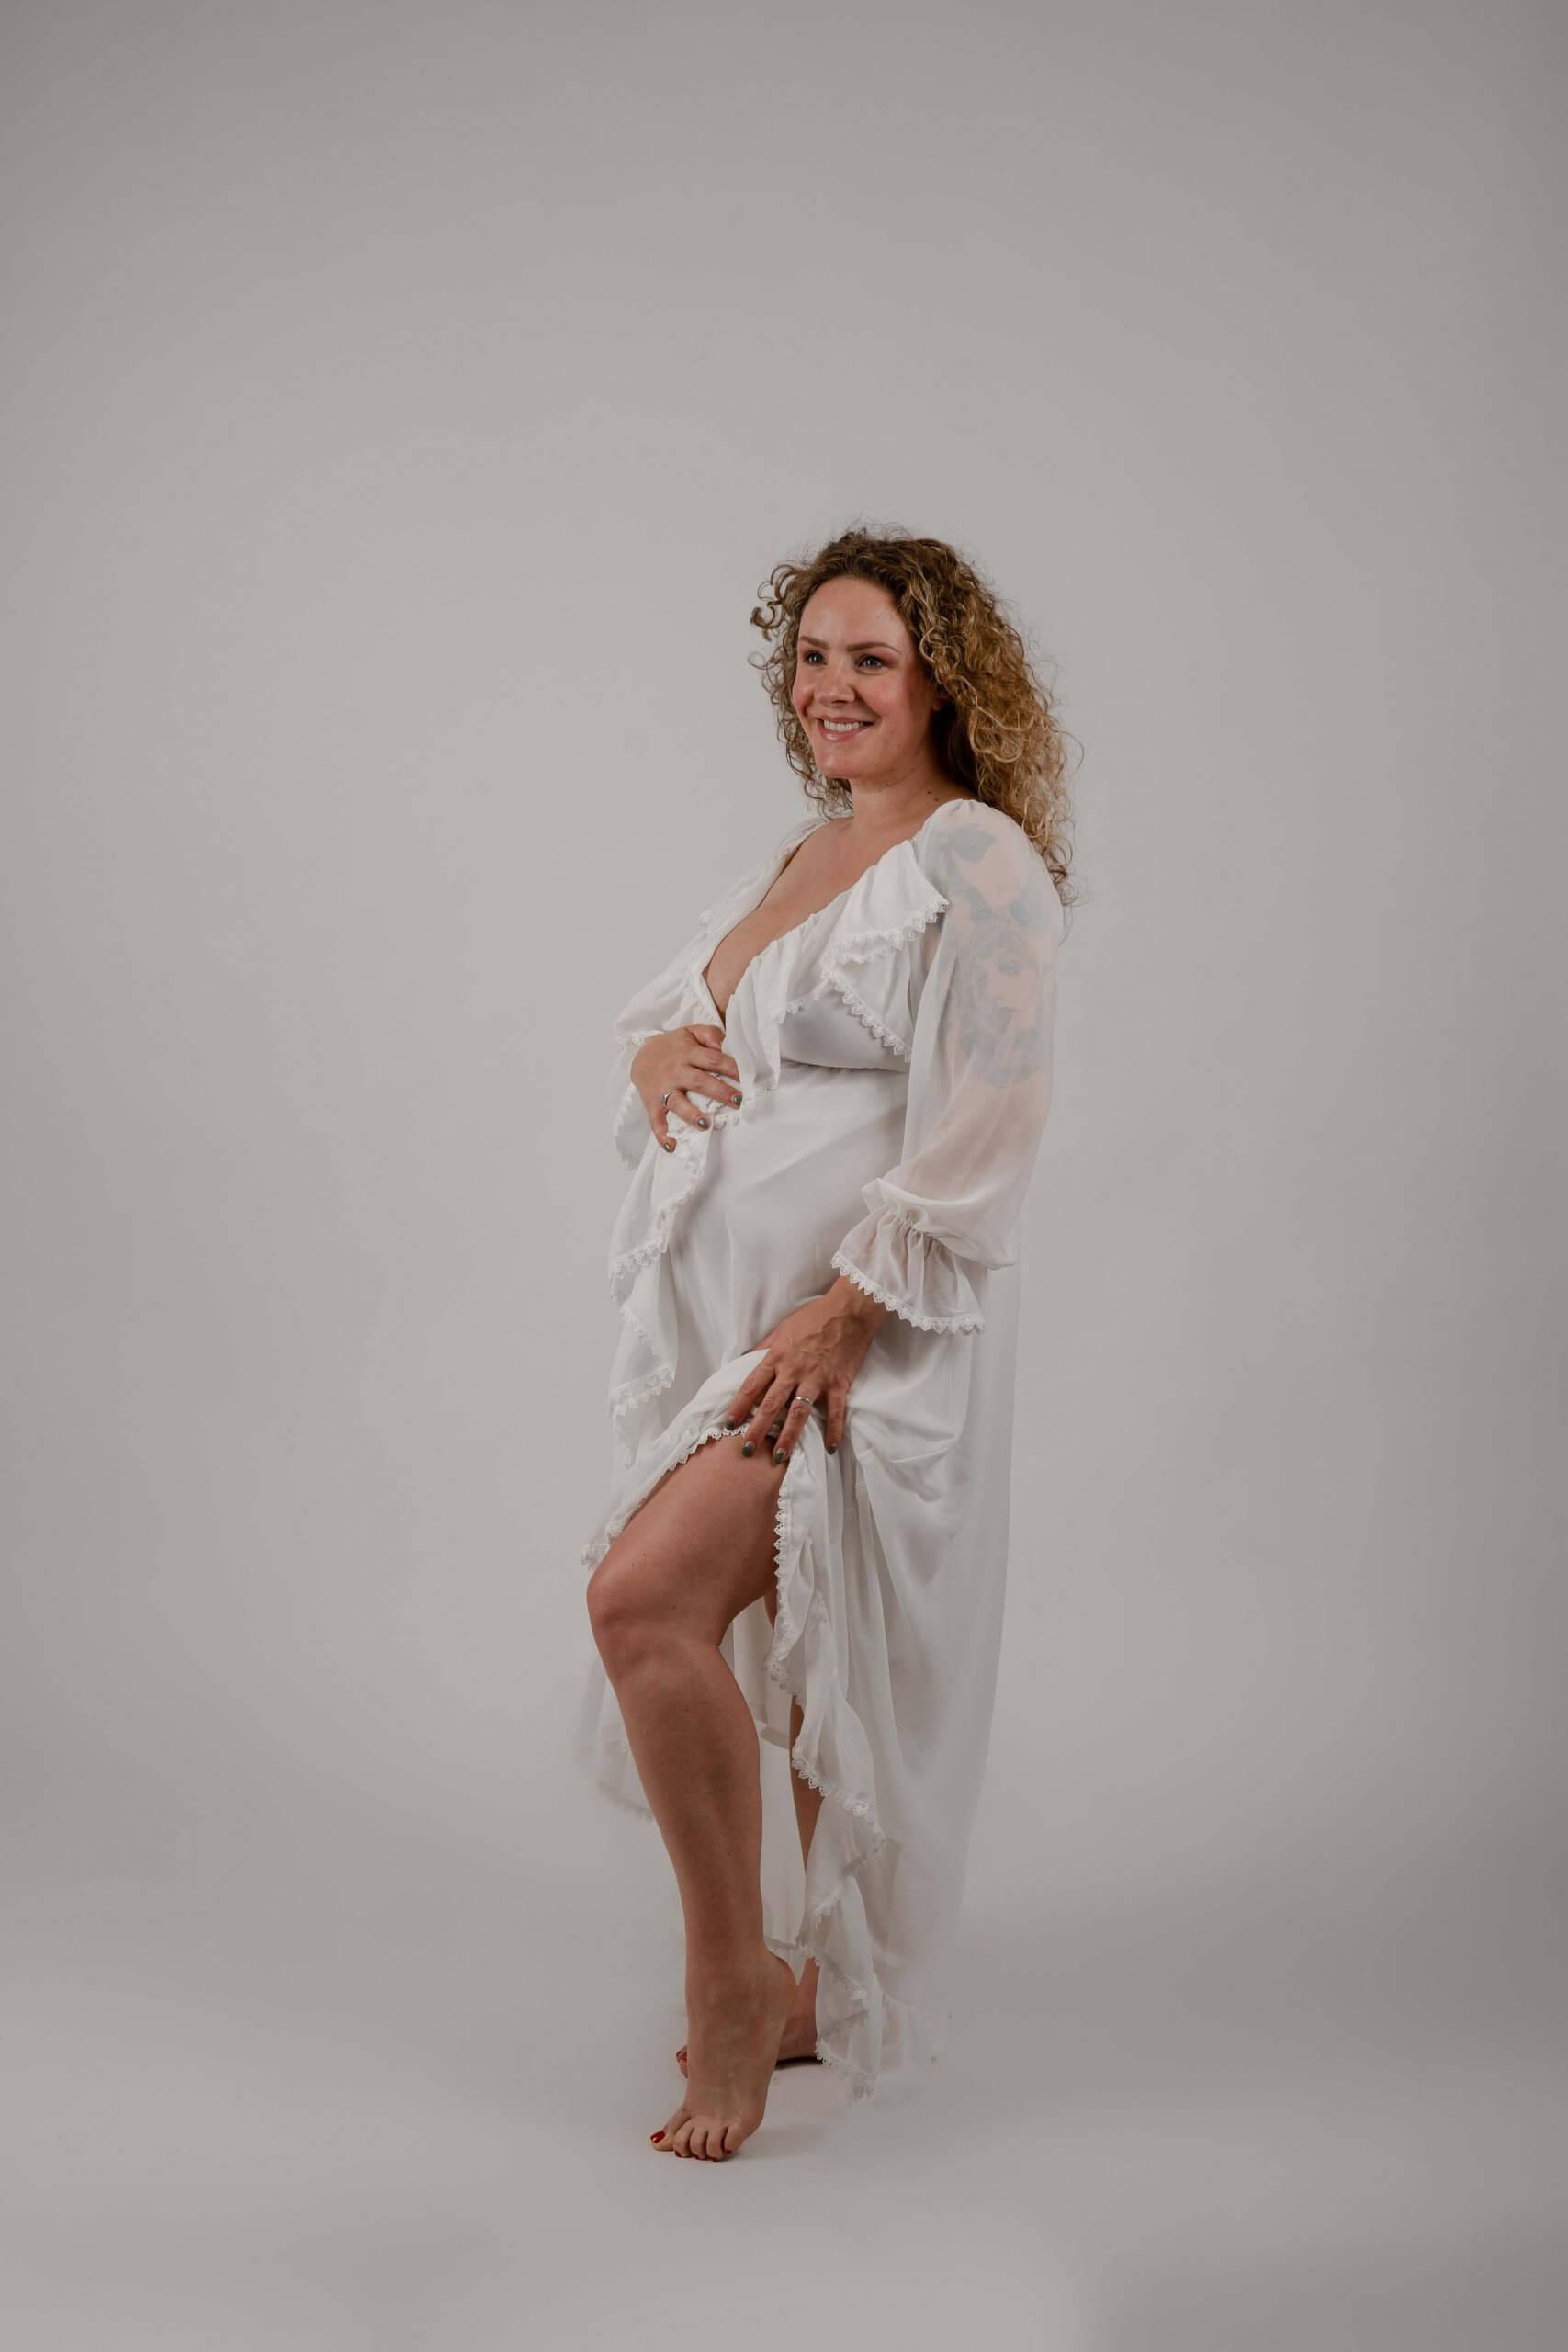 Garderobe jurk Lot wit mommy to be fotoshoot Utrecht